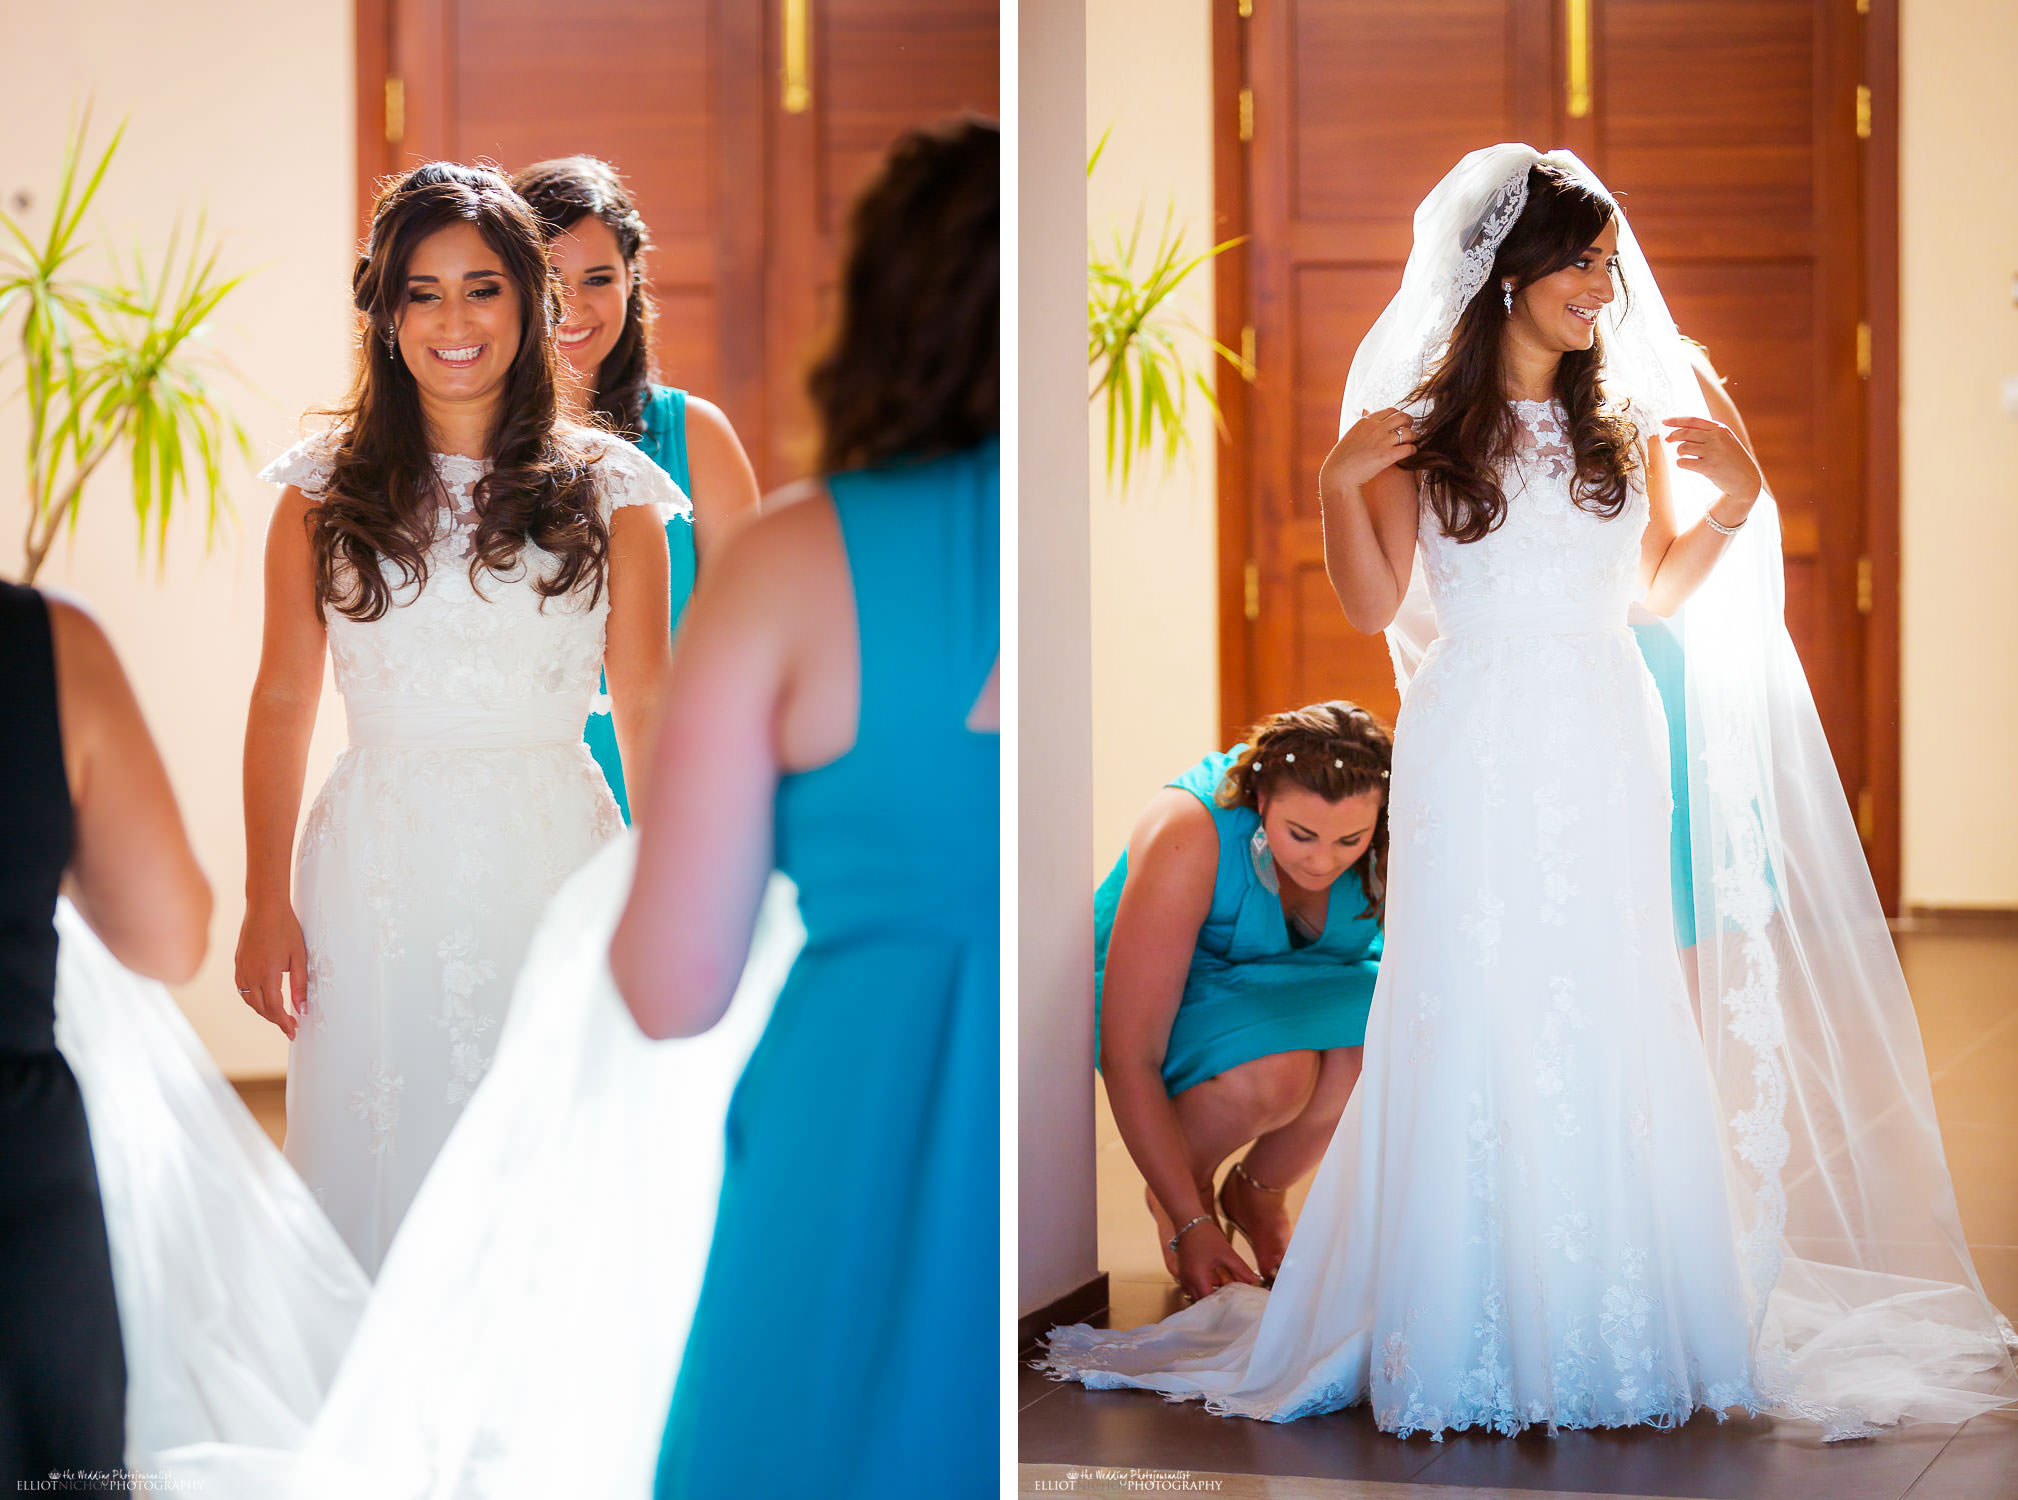 bride in her wedding dress put on her veil.